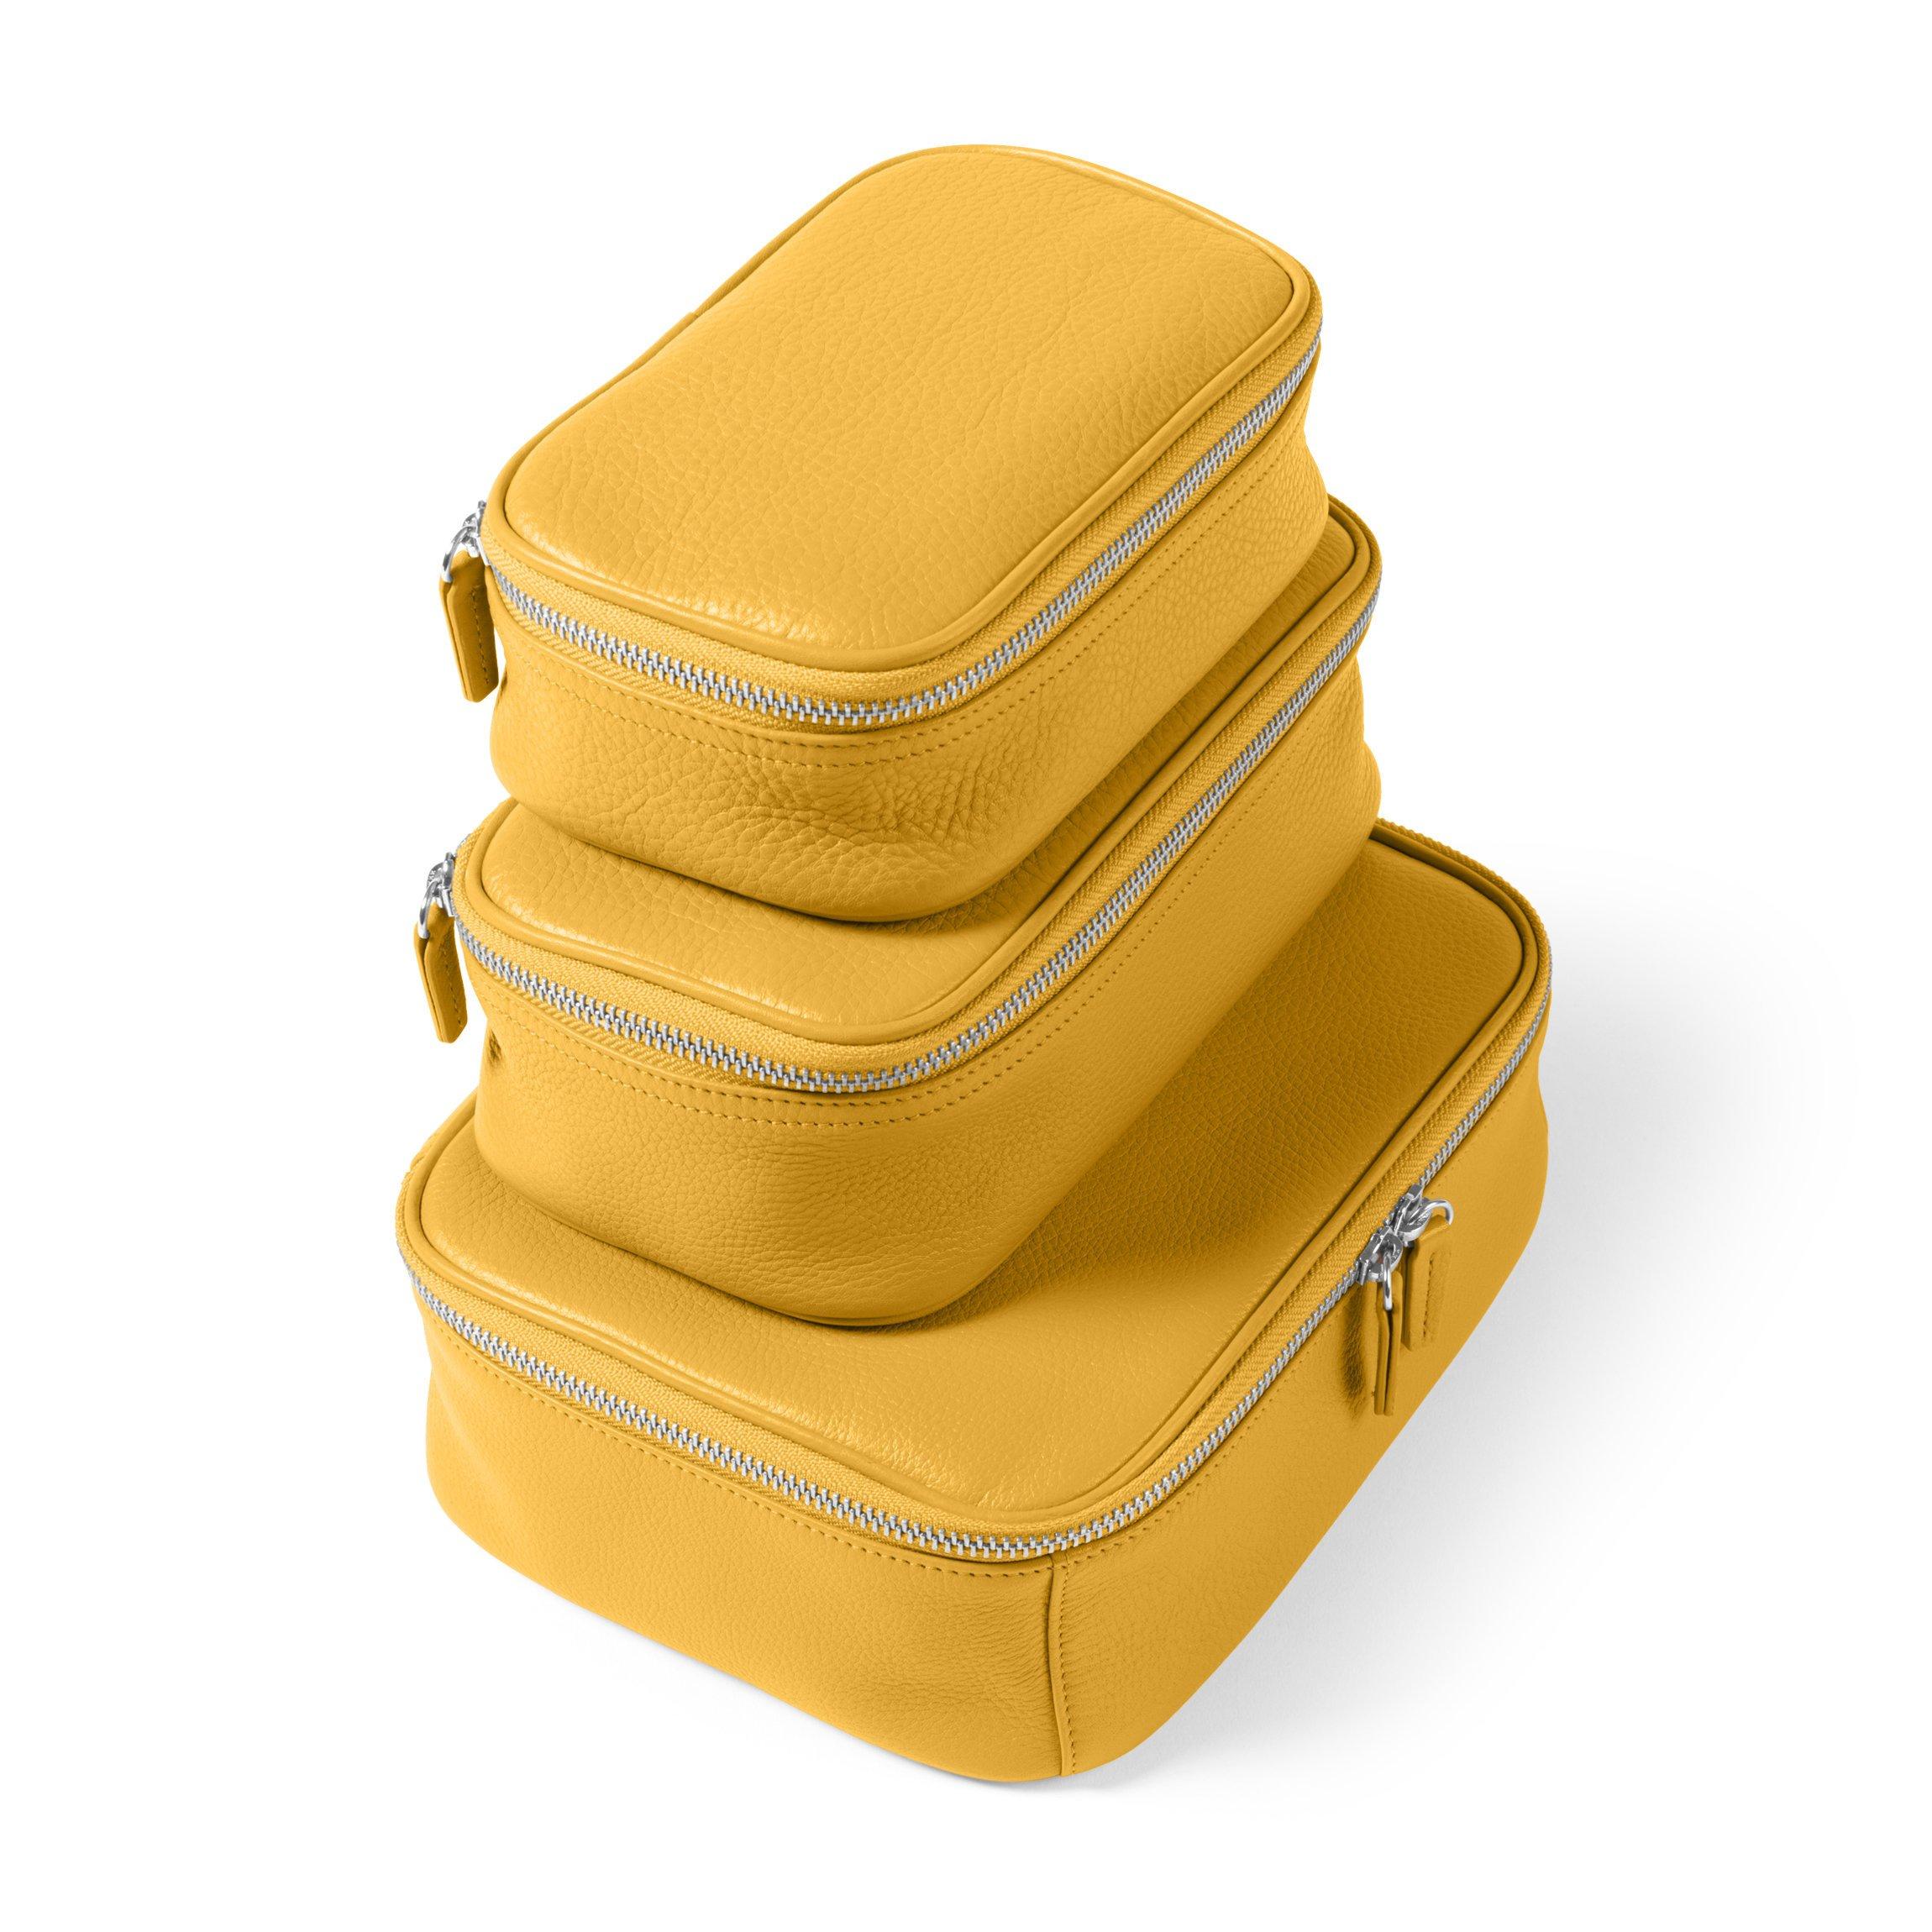 Leatherology Nested Travel Organizer Trio - Full Grain Leather Leather - Turmeric (Yellow)